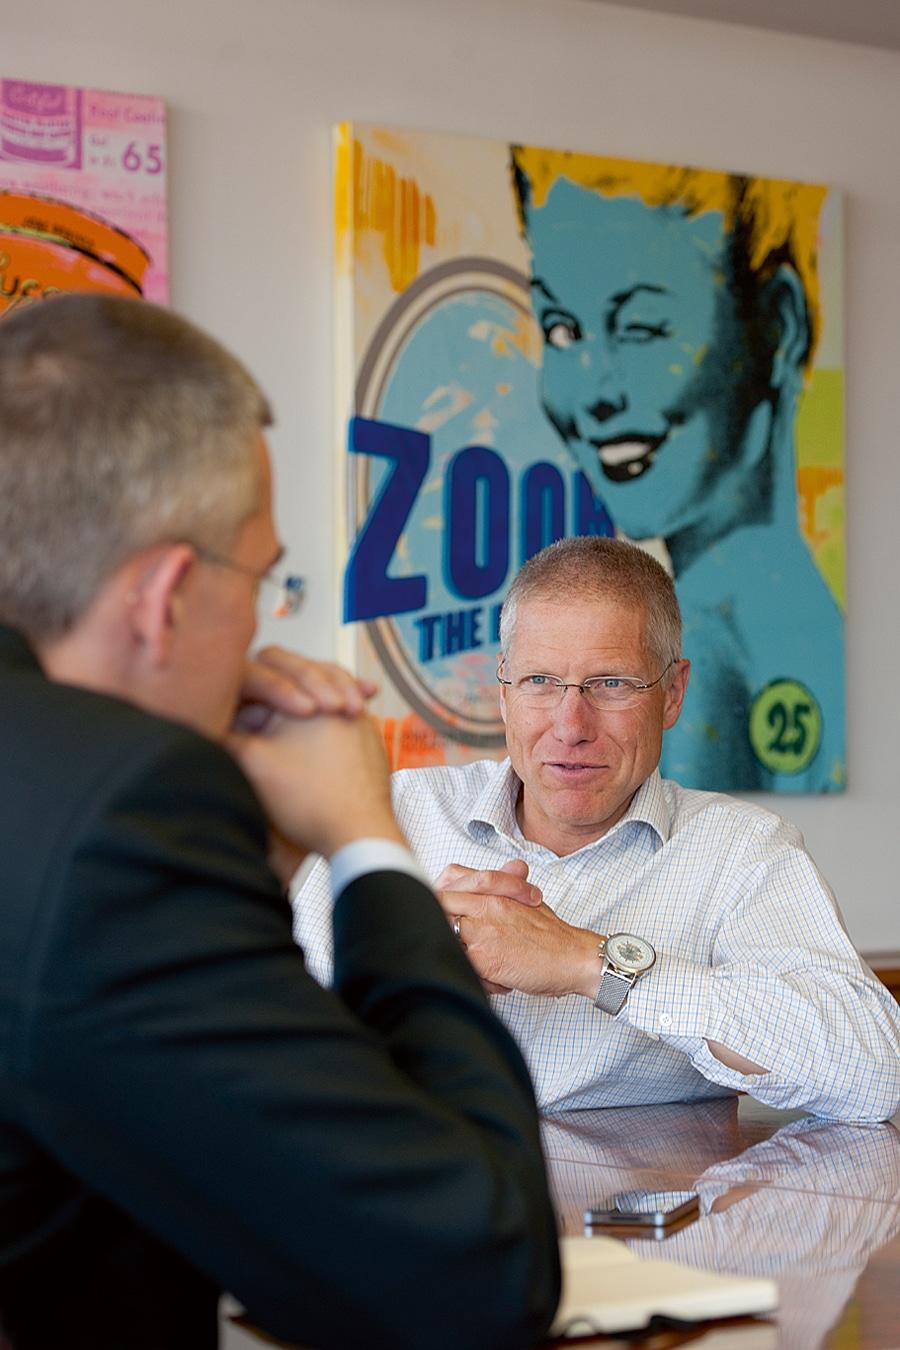 Chronos-Chefredakteur Rüdiger Bucher, Breitling-Vizepräsident Jean-Paul Girardin